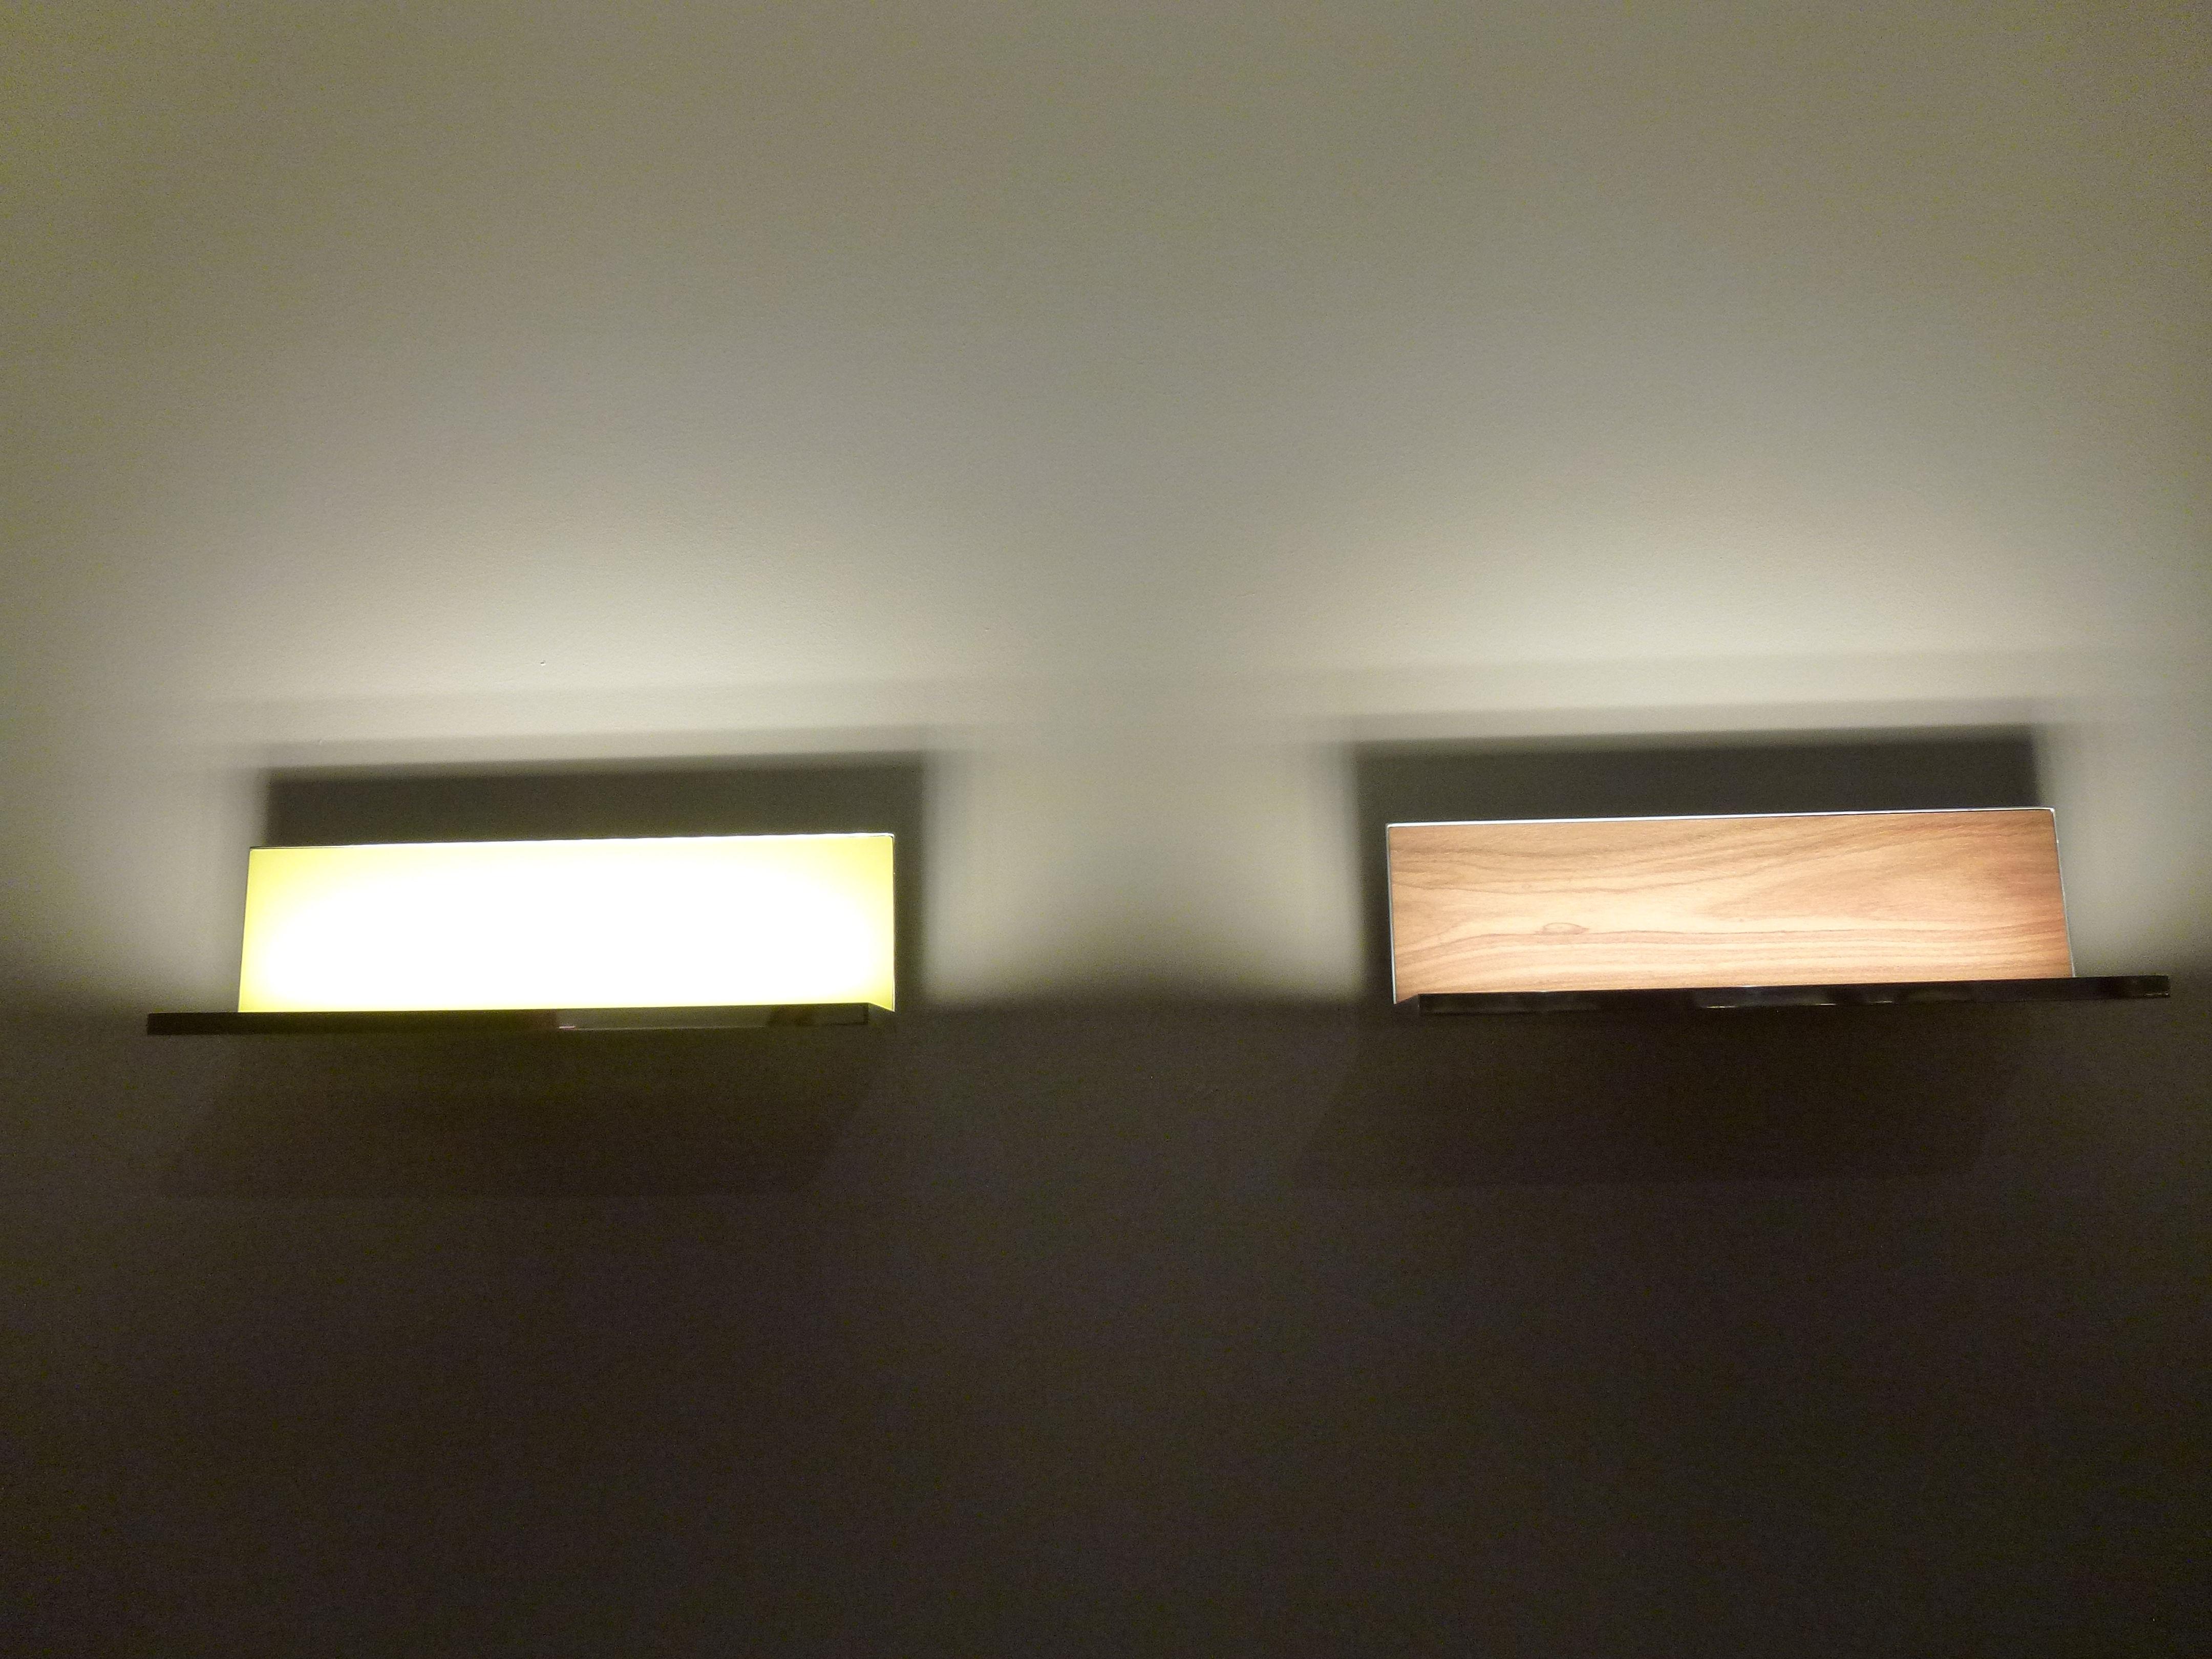 Plafoniere Da Soffitto Flos : Hide l applique led 40 cm nero brillante by flos made in design